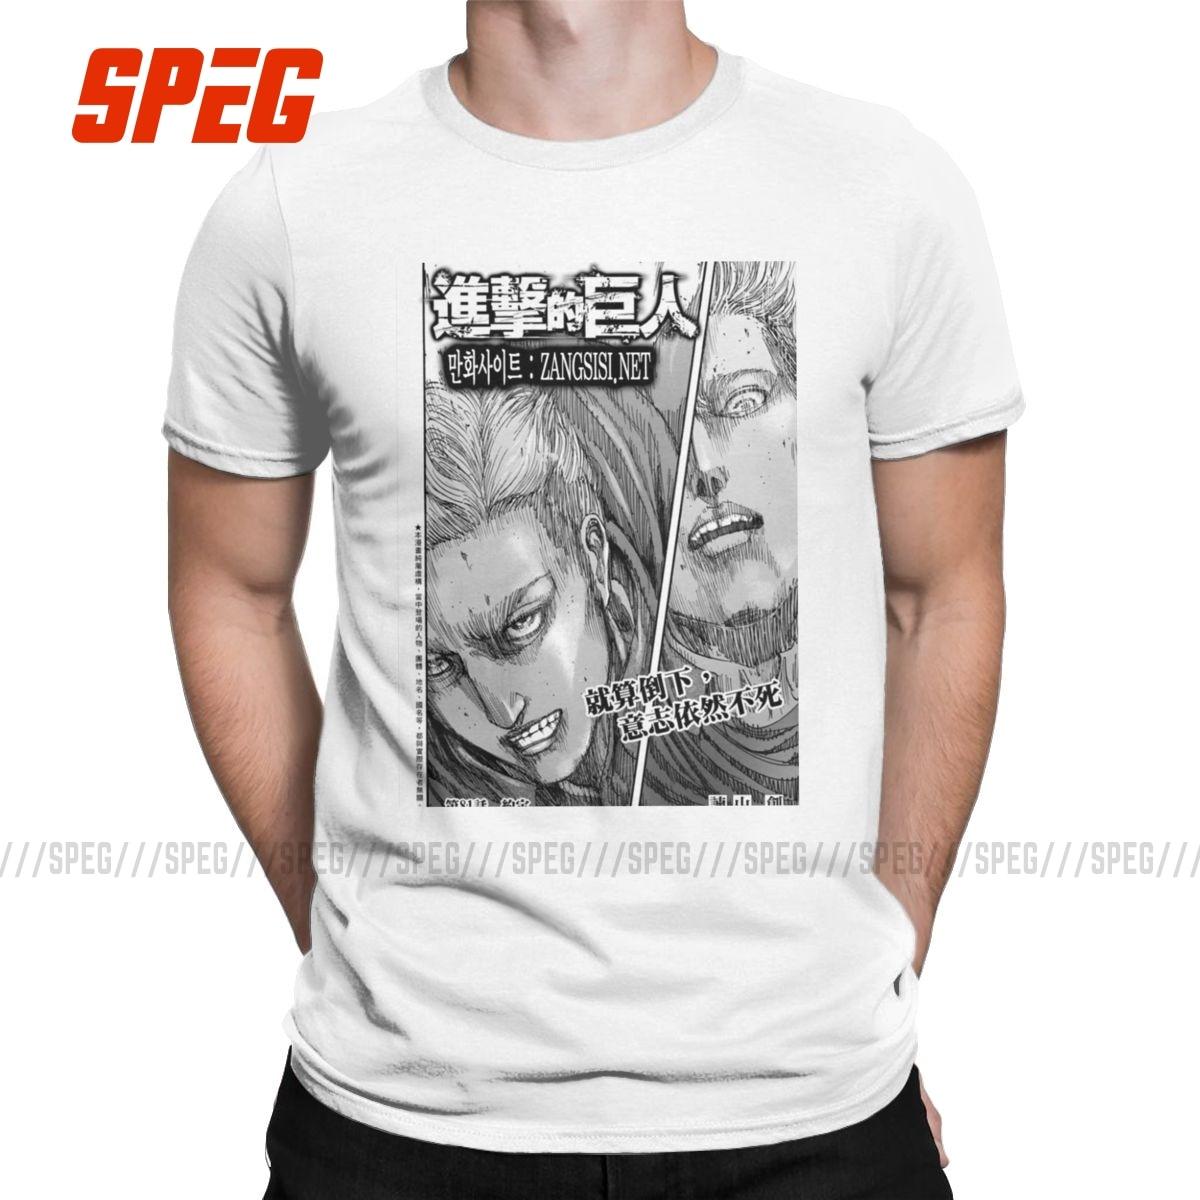 camiseta-de-attack-on-titan-para-hombre-camisetas-divertidas-de-algodon-de-100-camiseta-de-cuello-redondo-camisetas-de-manga-corta-camisetas-clasicas